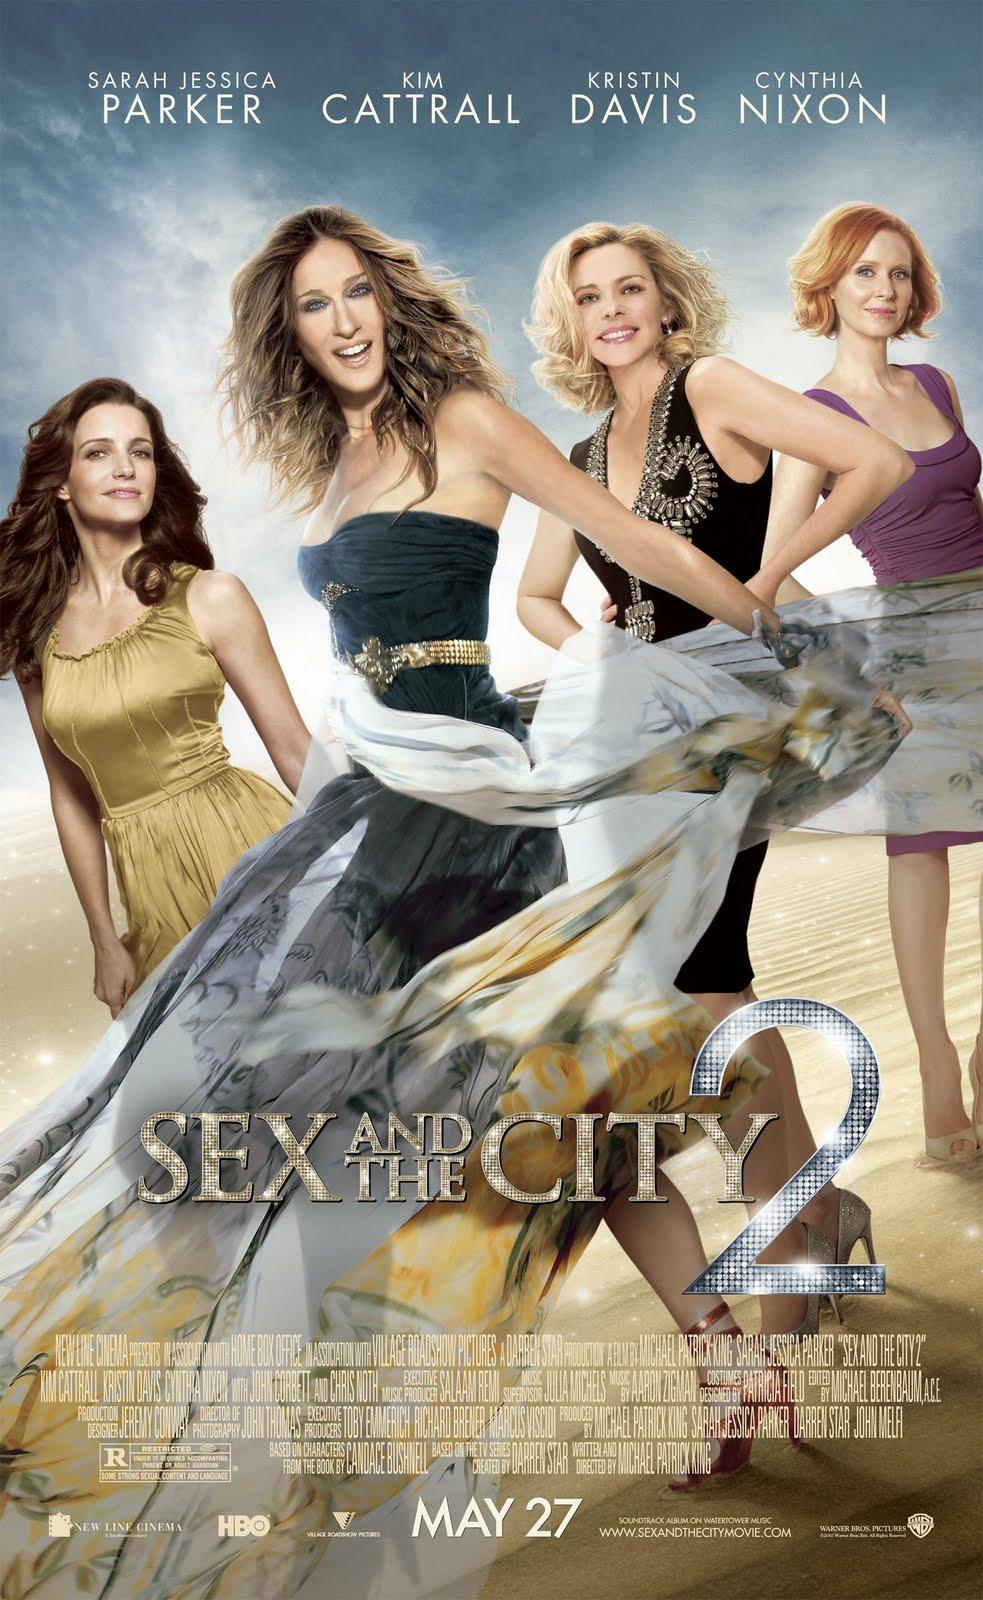 sex and the city 2 movie poster sarah jessica parker kim cattrall kristin davis and cynthia nixon Adult bipolar MRSI study